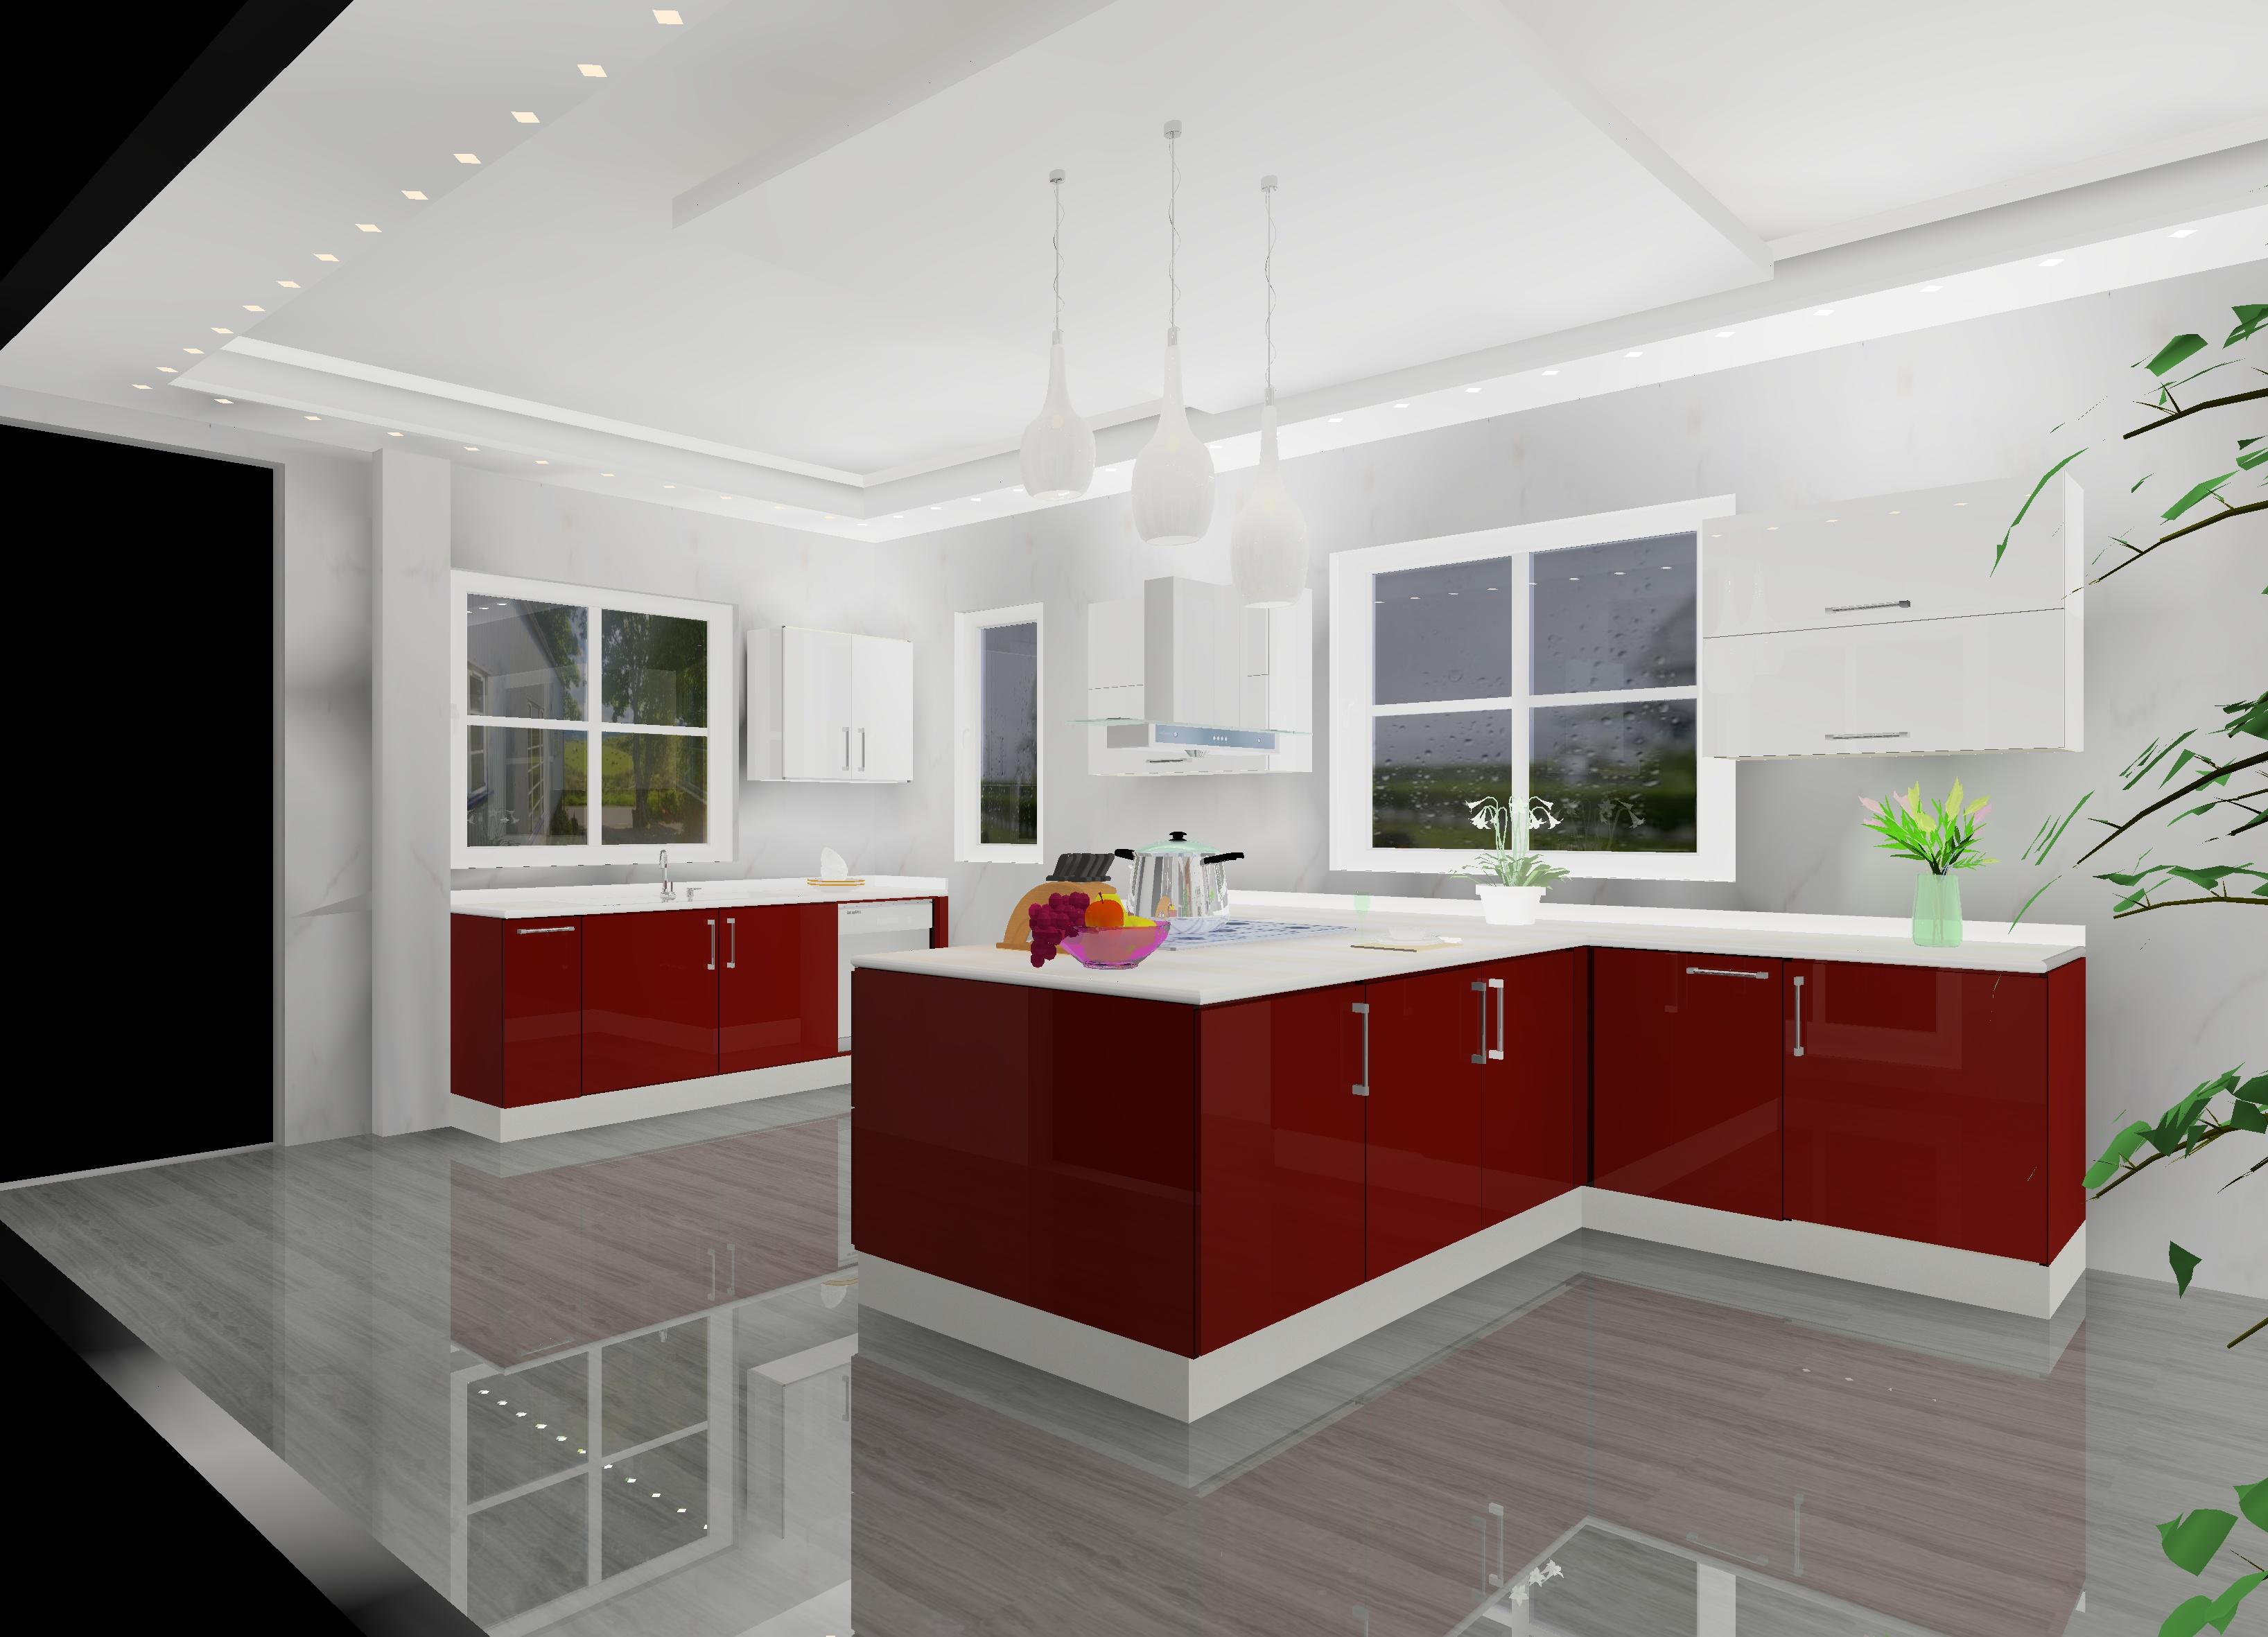 Sabri - Azadpur - Ideas Modular Kitchens